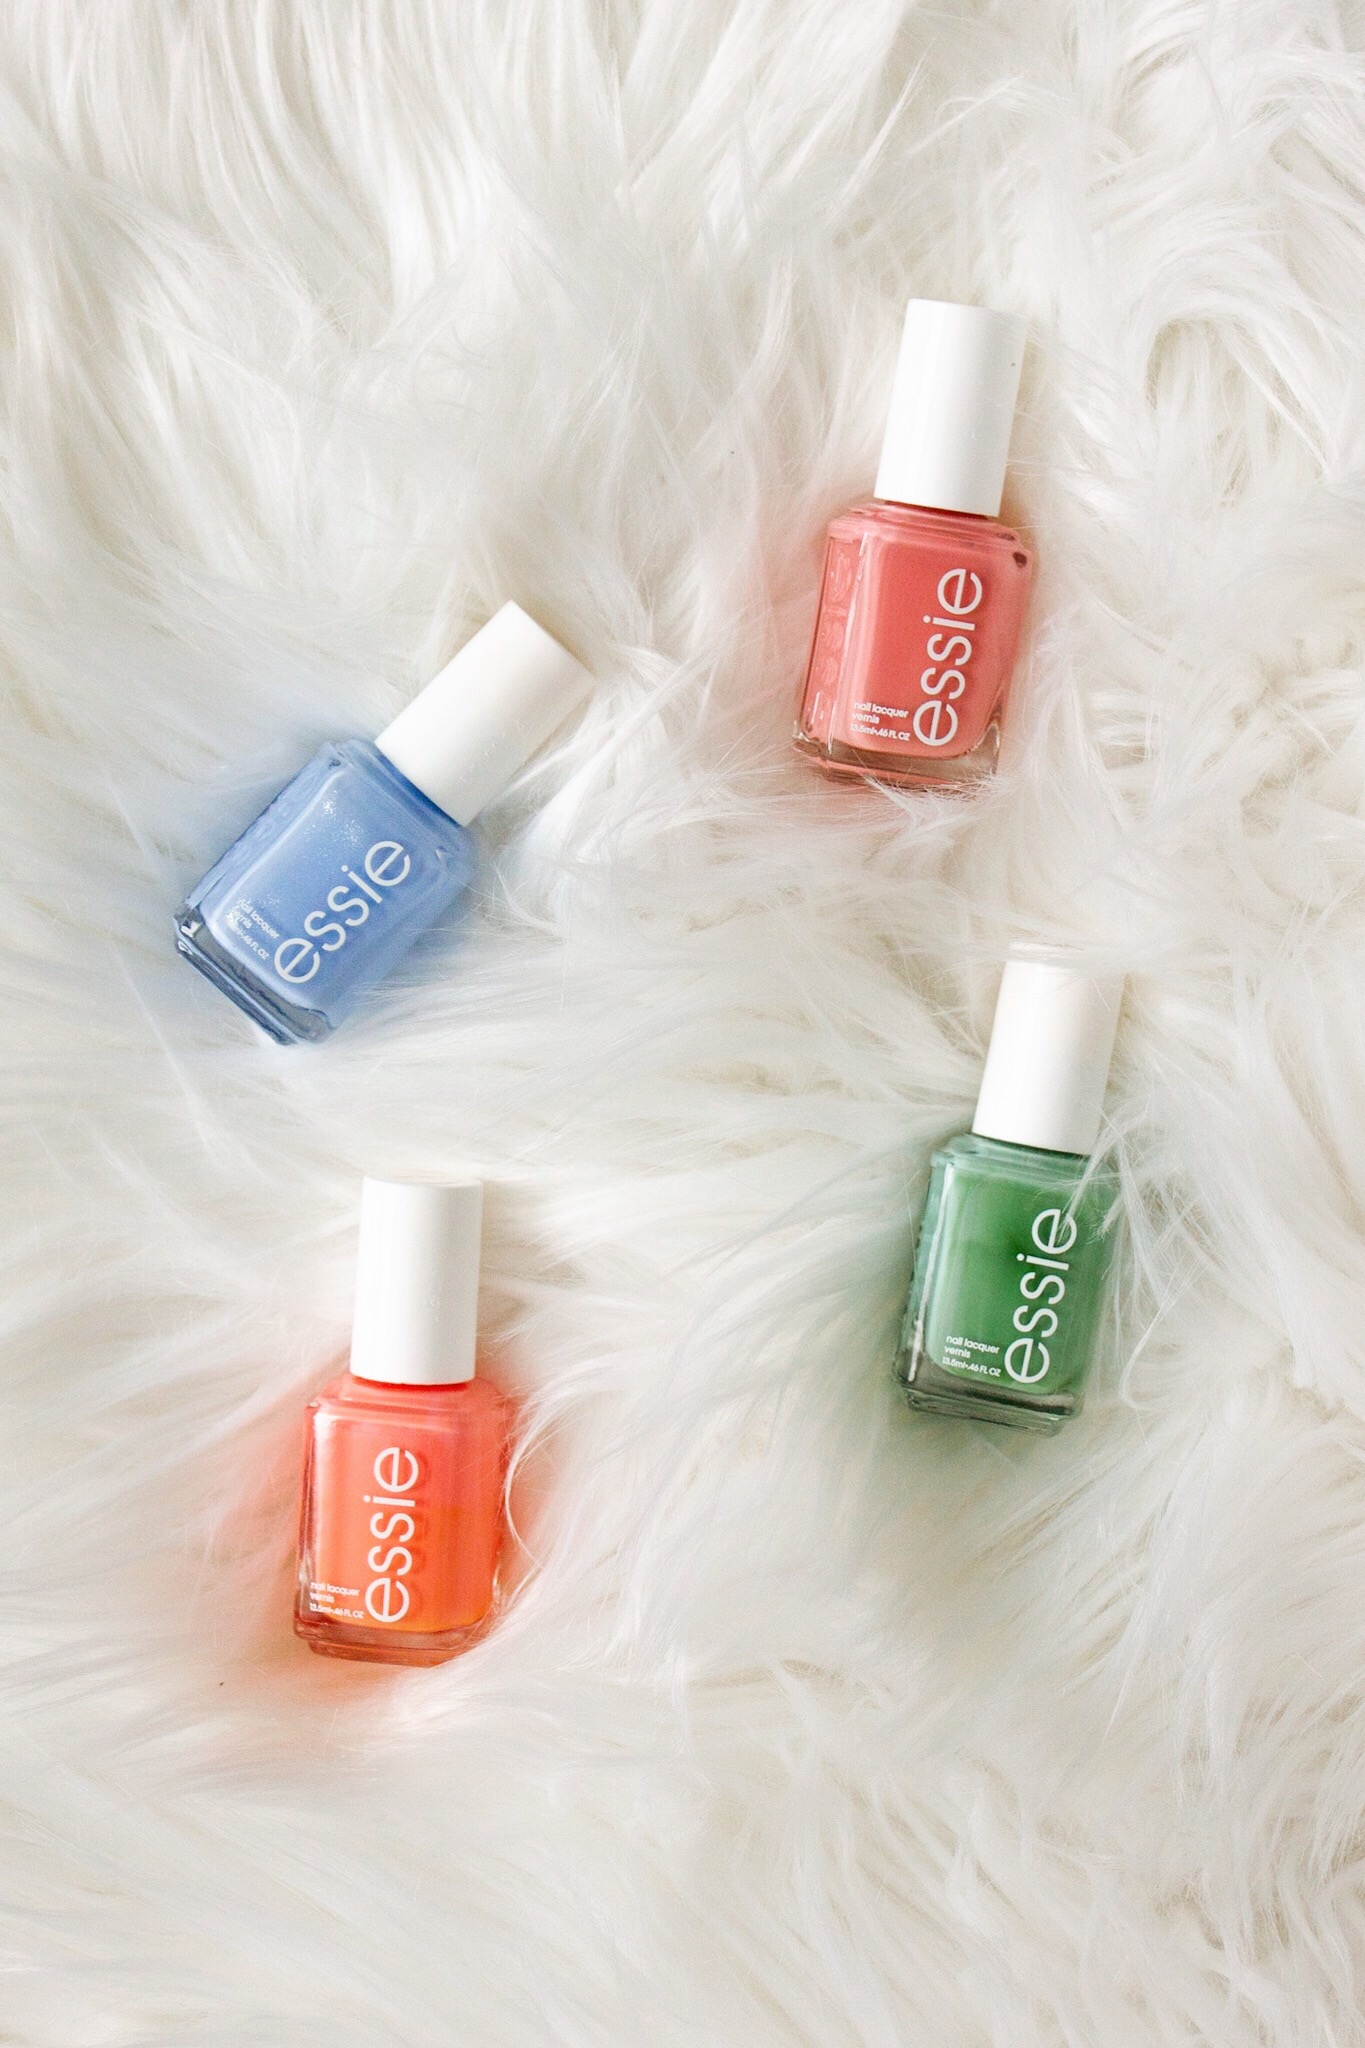 Bikini So Teeny (blue), Perfect Mate (pink), Mojito Madness (green), Tart Deco (coral)